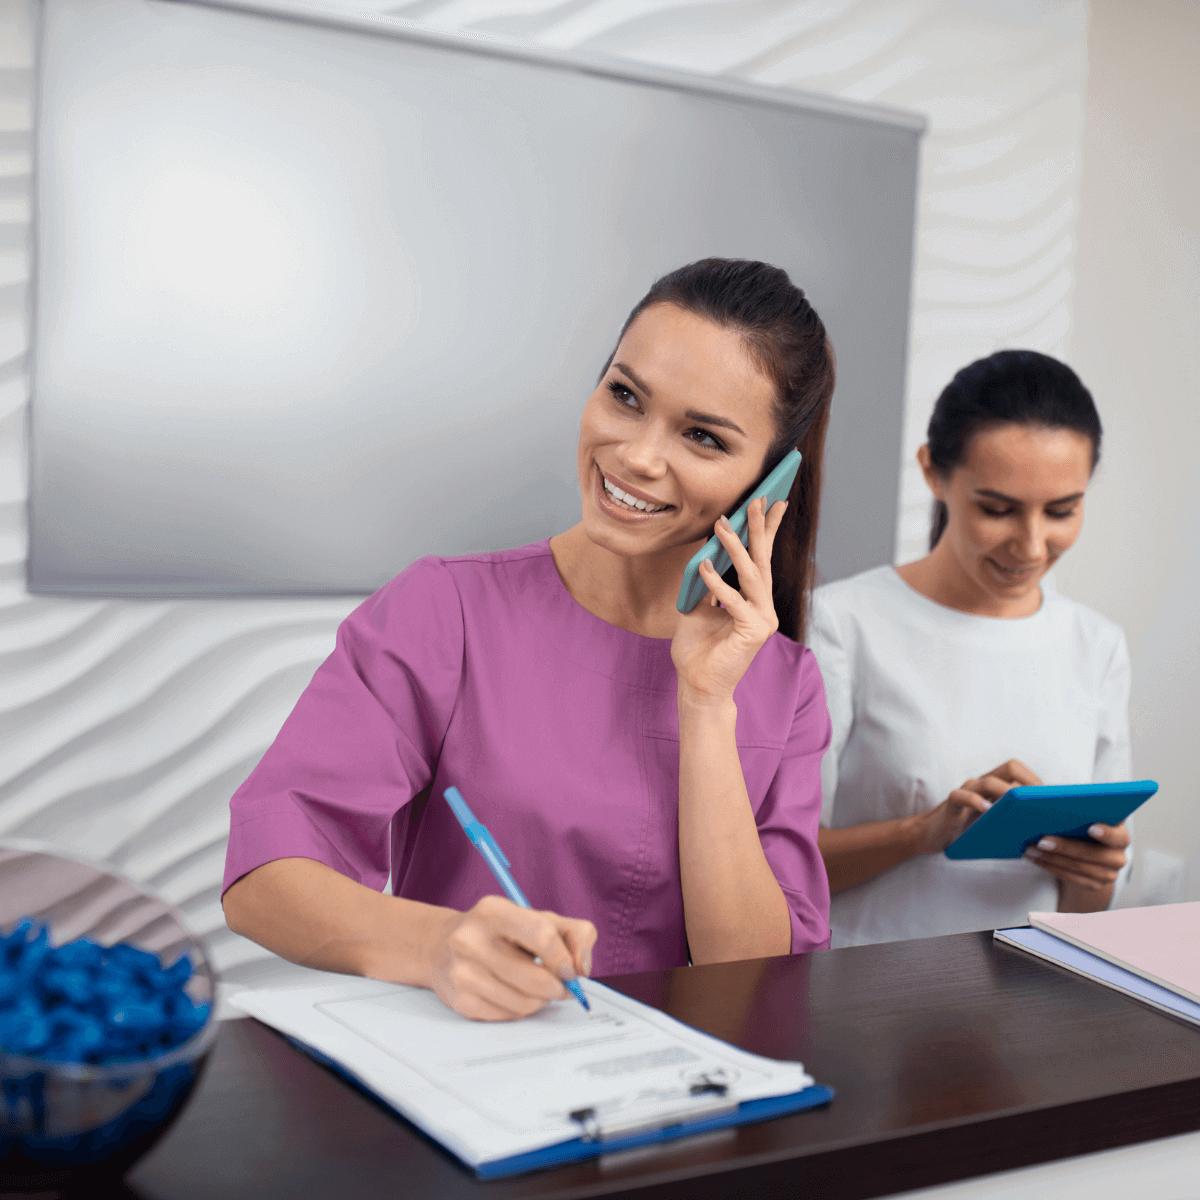 Taller imagen y comunicación para asistentes